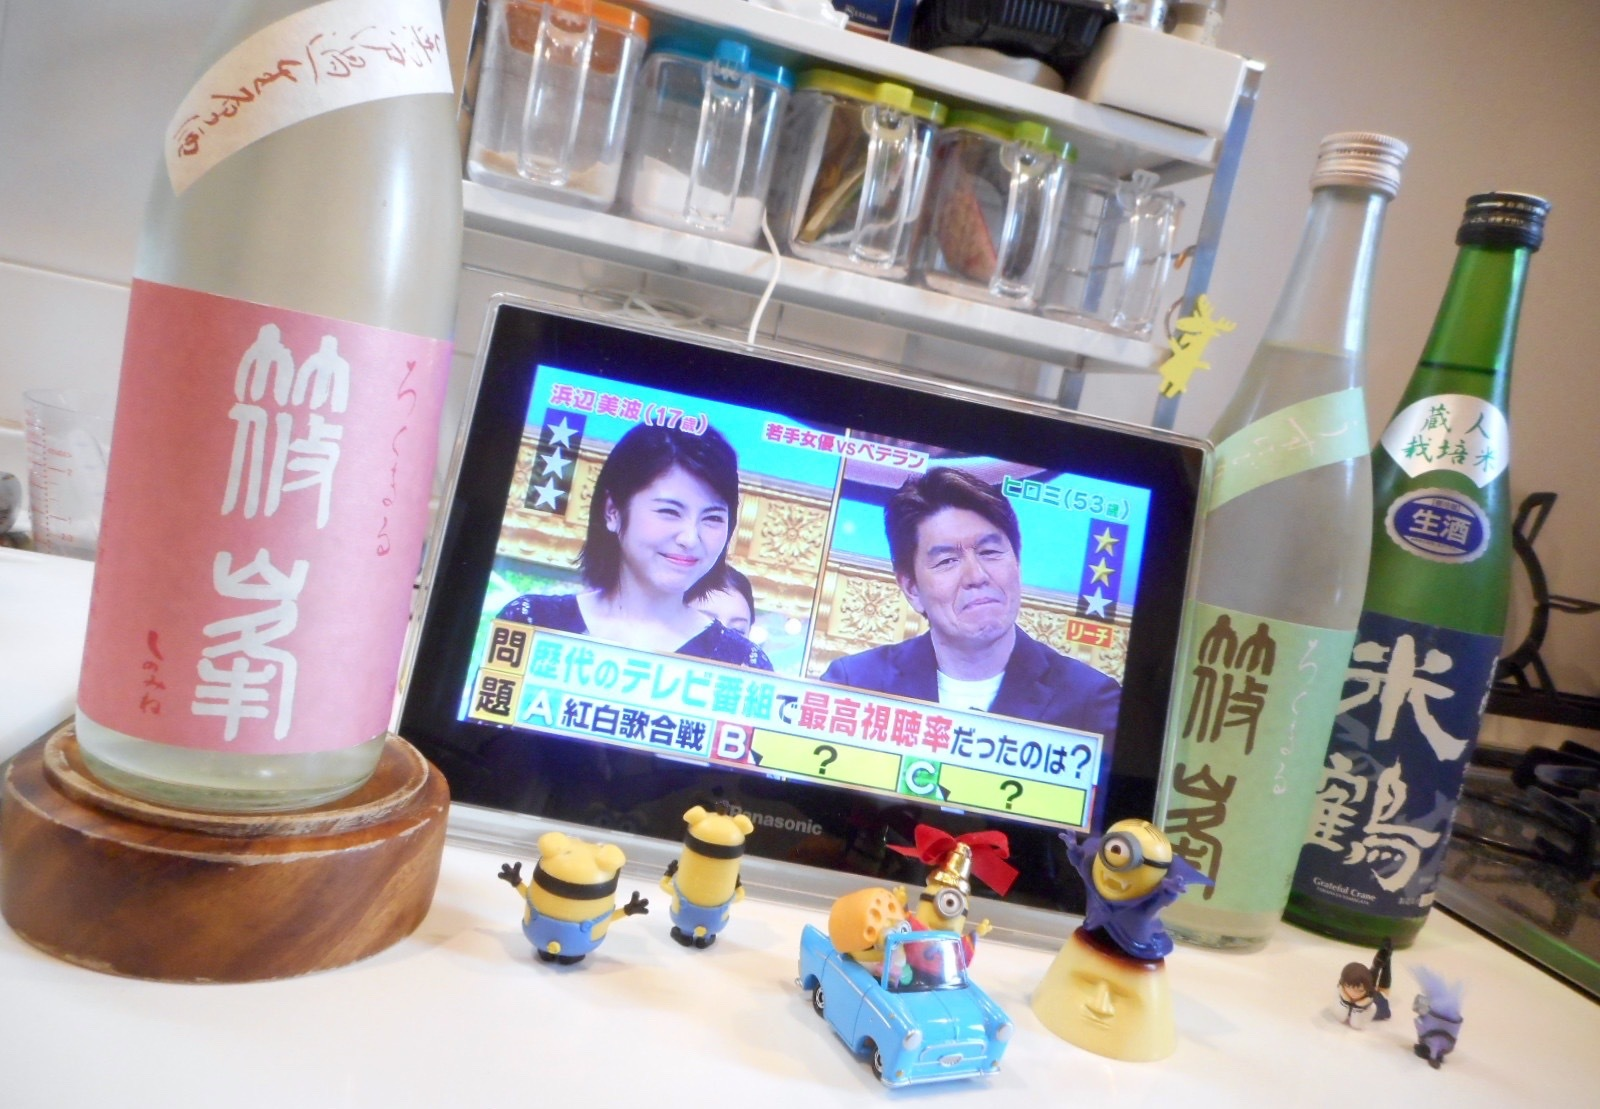 rokumaru_omachi29by1.jpg